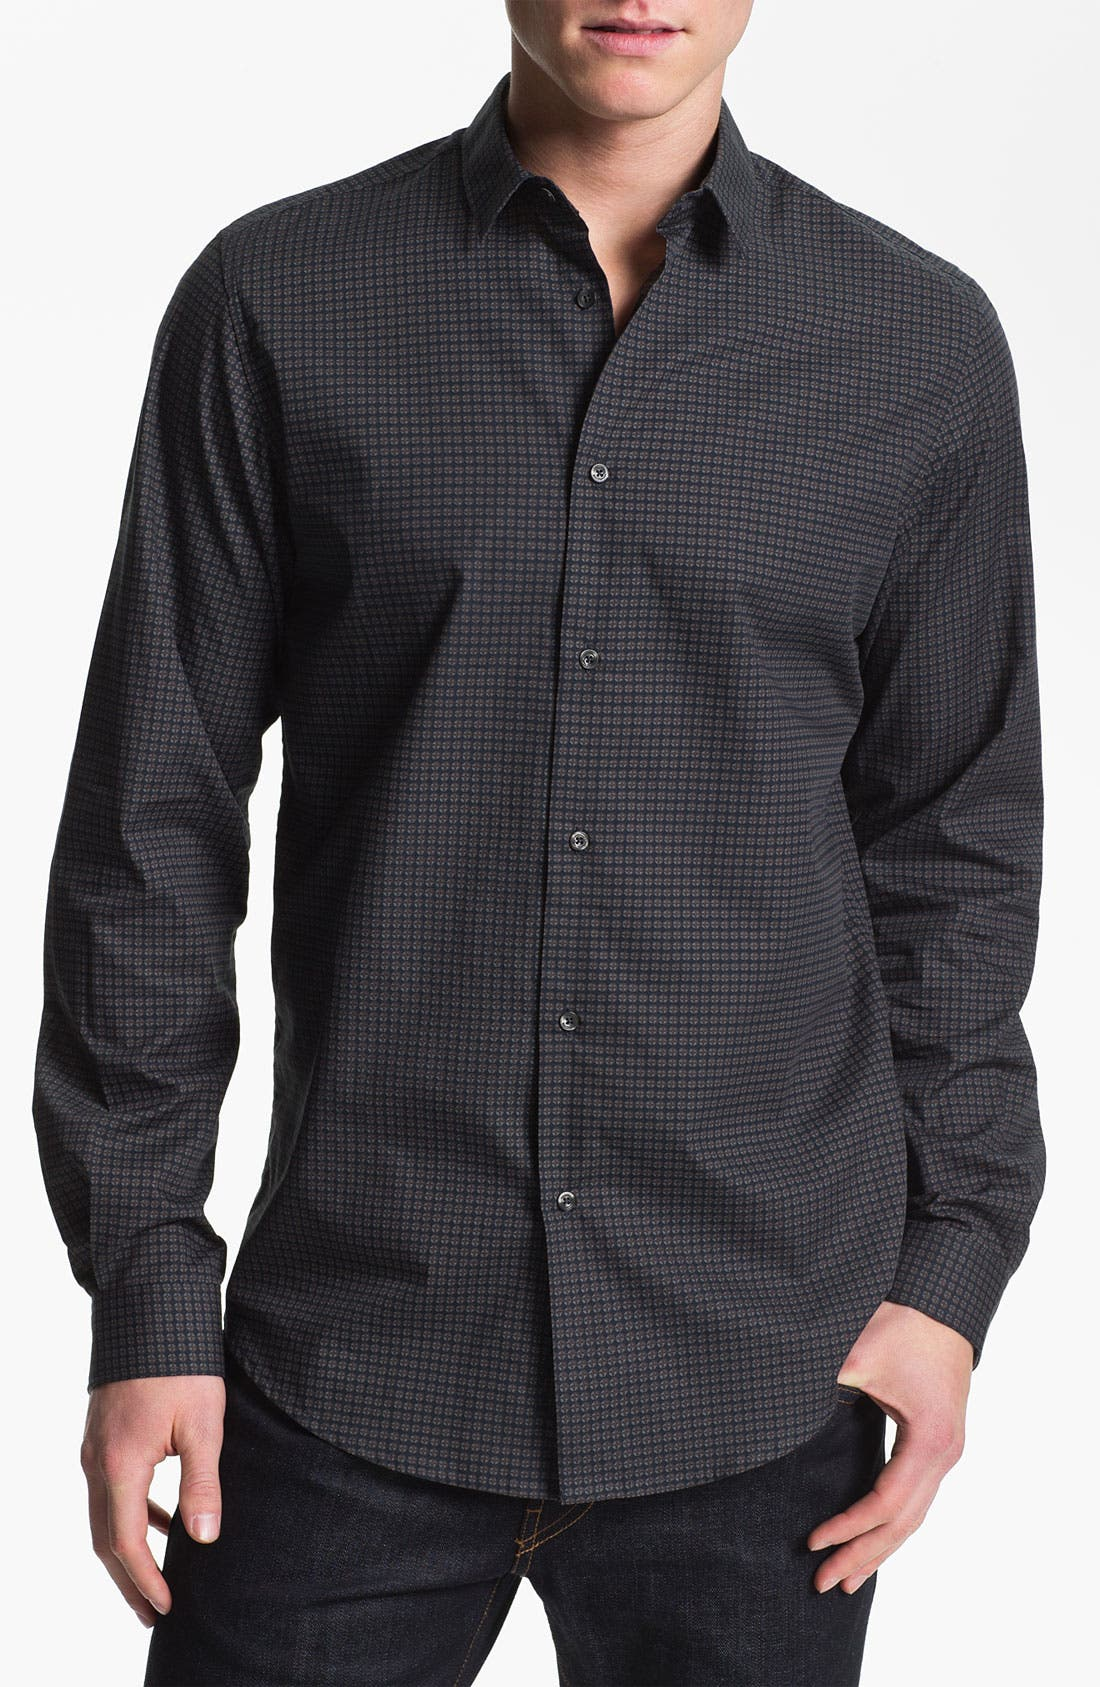 Alternate Image 1 Selected - Ben Sherman 'Kensington' Woven Shirt